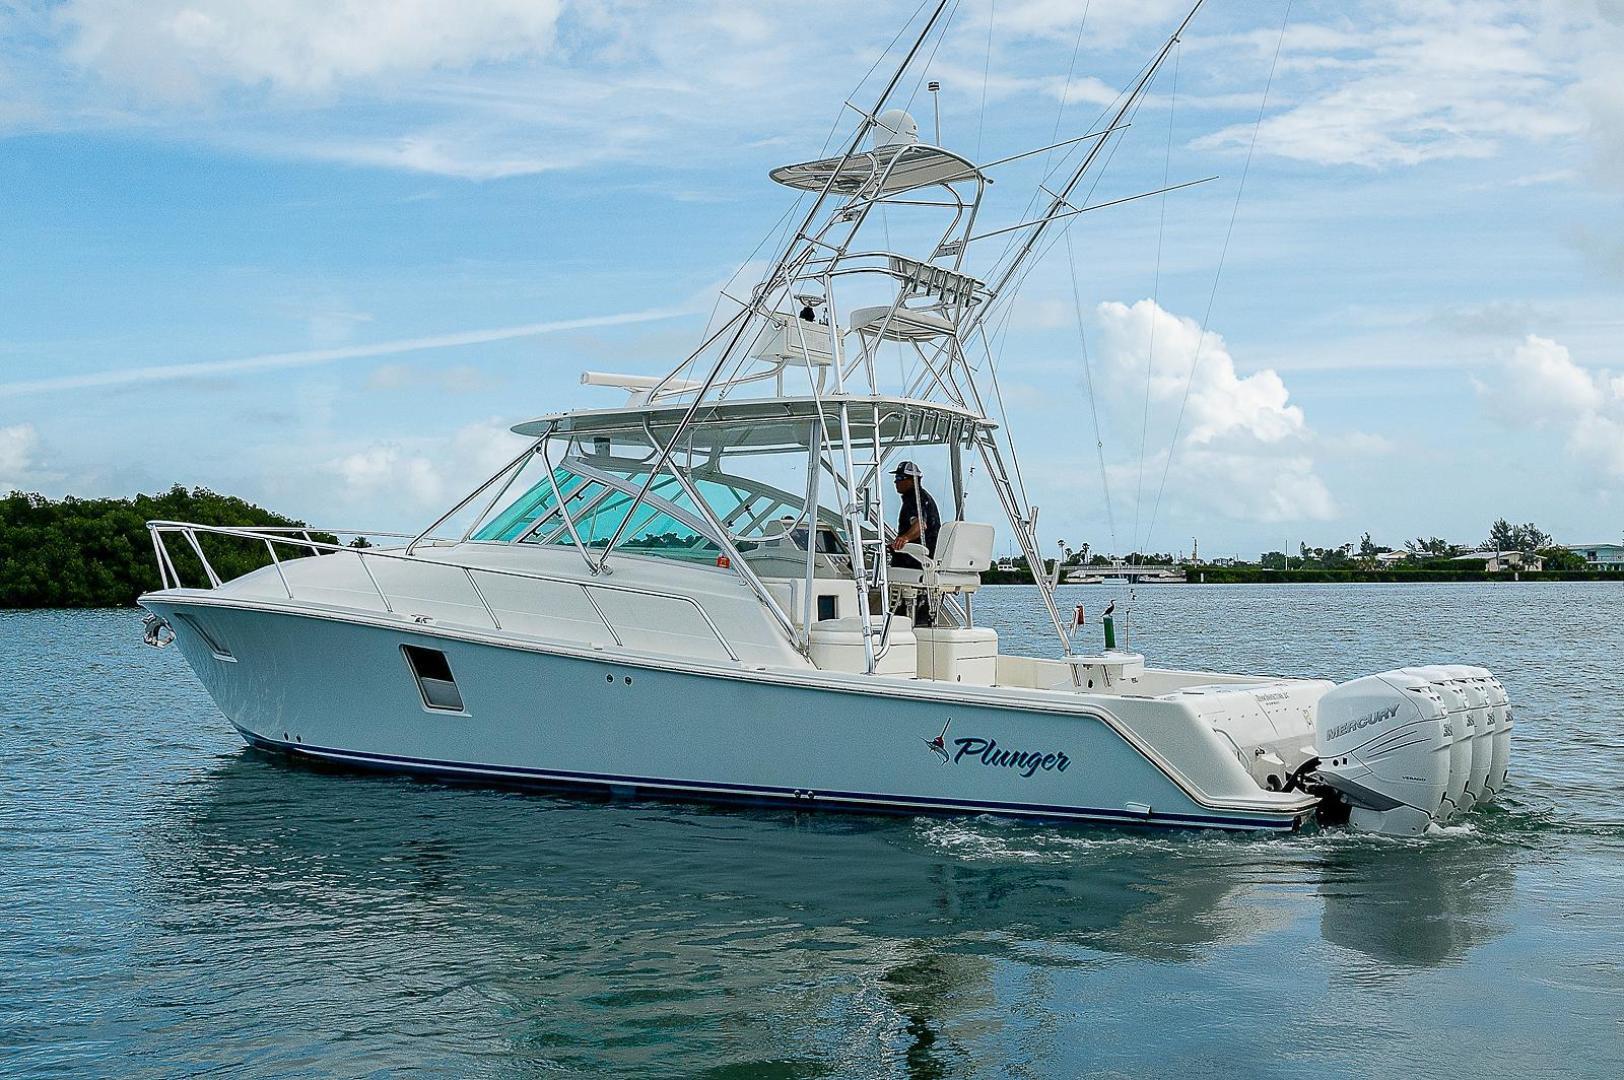 SeaVee 2013-Plunger Key Colony Beach-Florida-United States-1594539 | Thumbnail